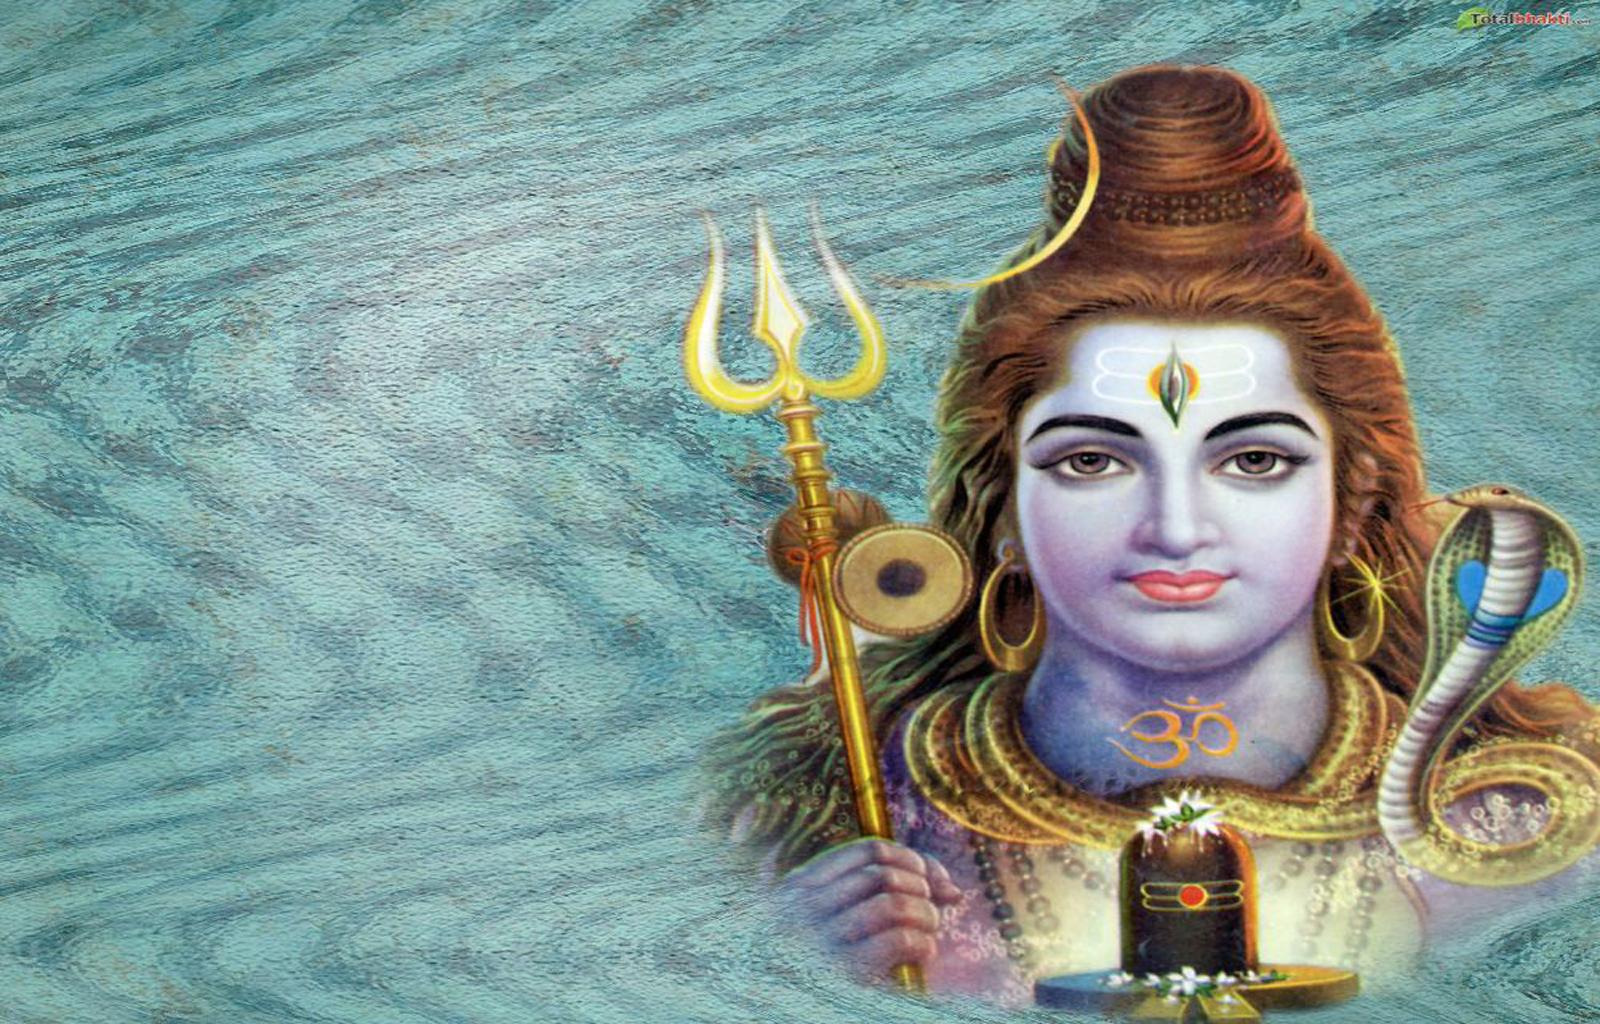 Wallpaper Gallery Lord Shiva Wallpaper   3 1600x1024